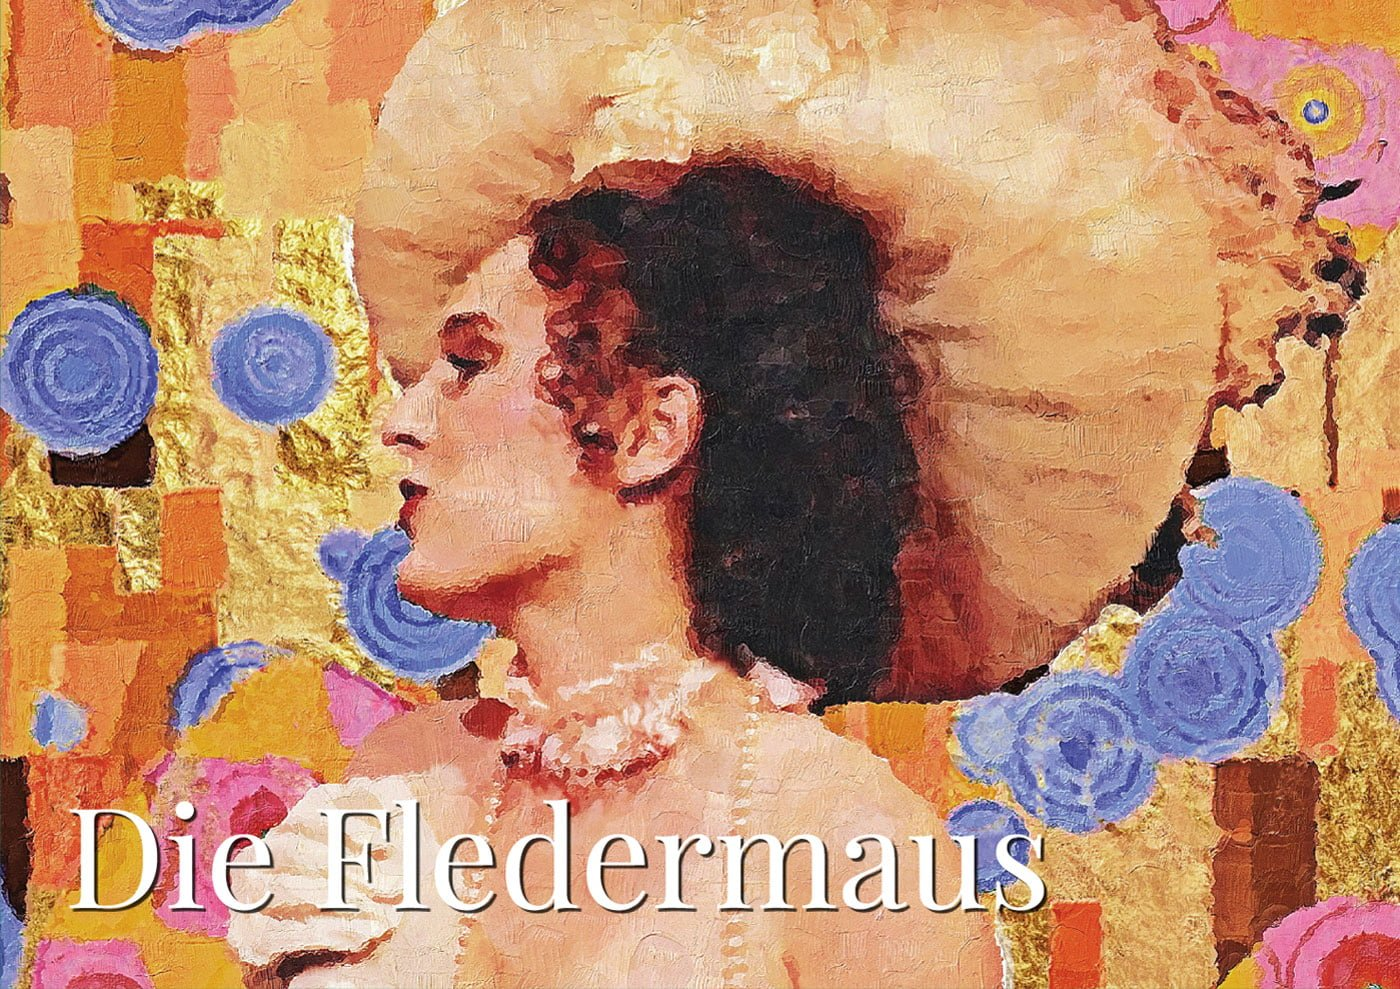 Die Fledermaus - Season 2019 ~ Gilbert & Sullivan Opera Victoria